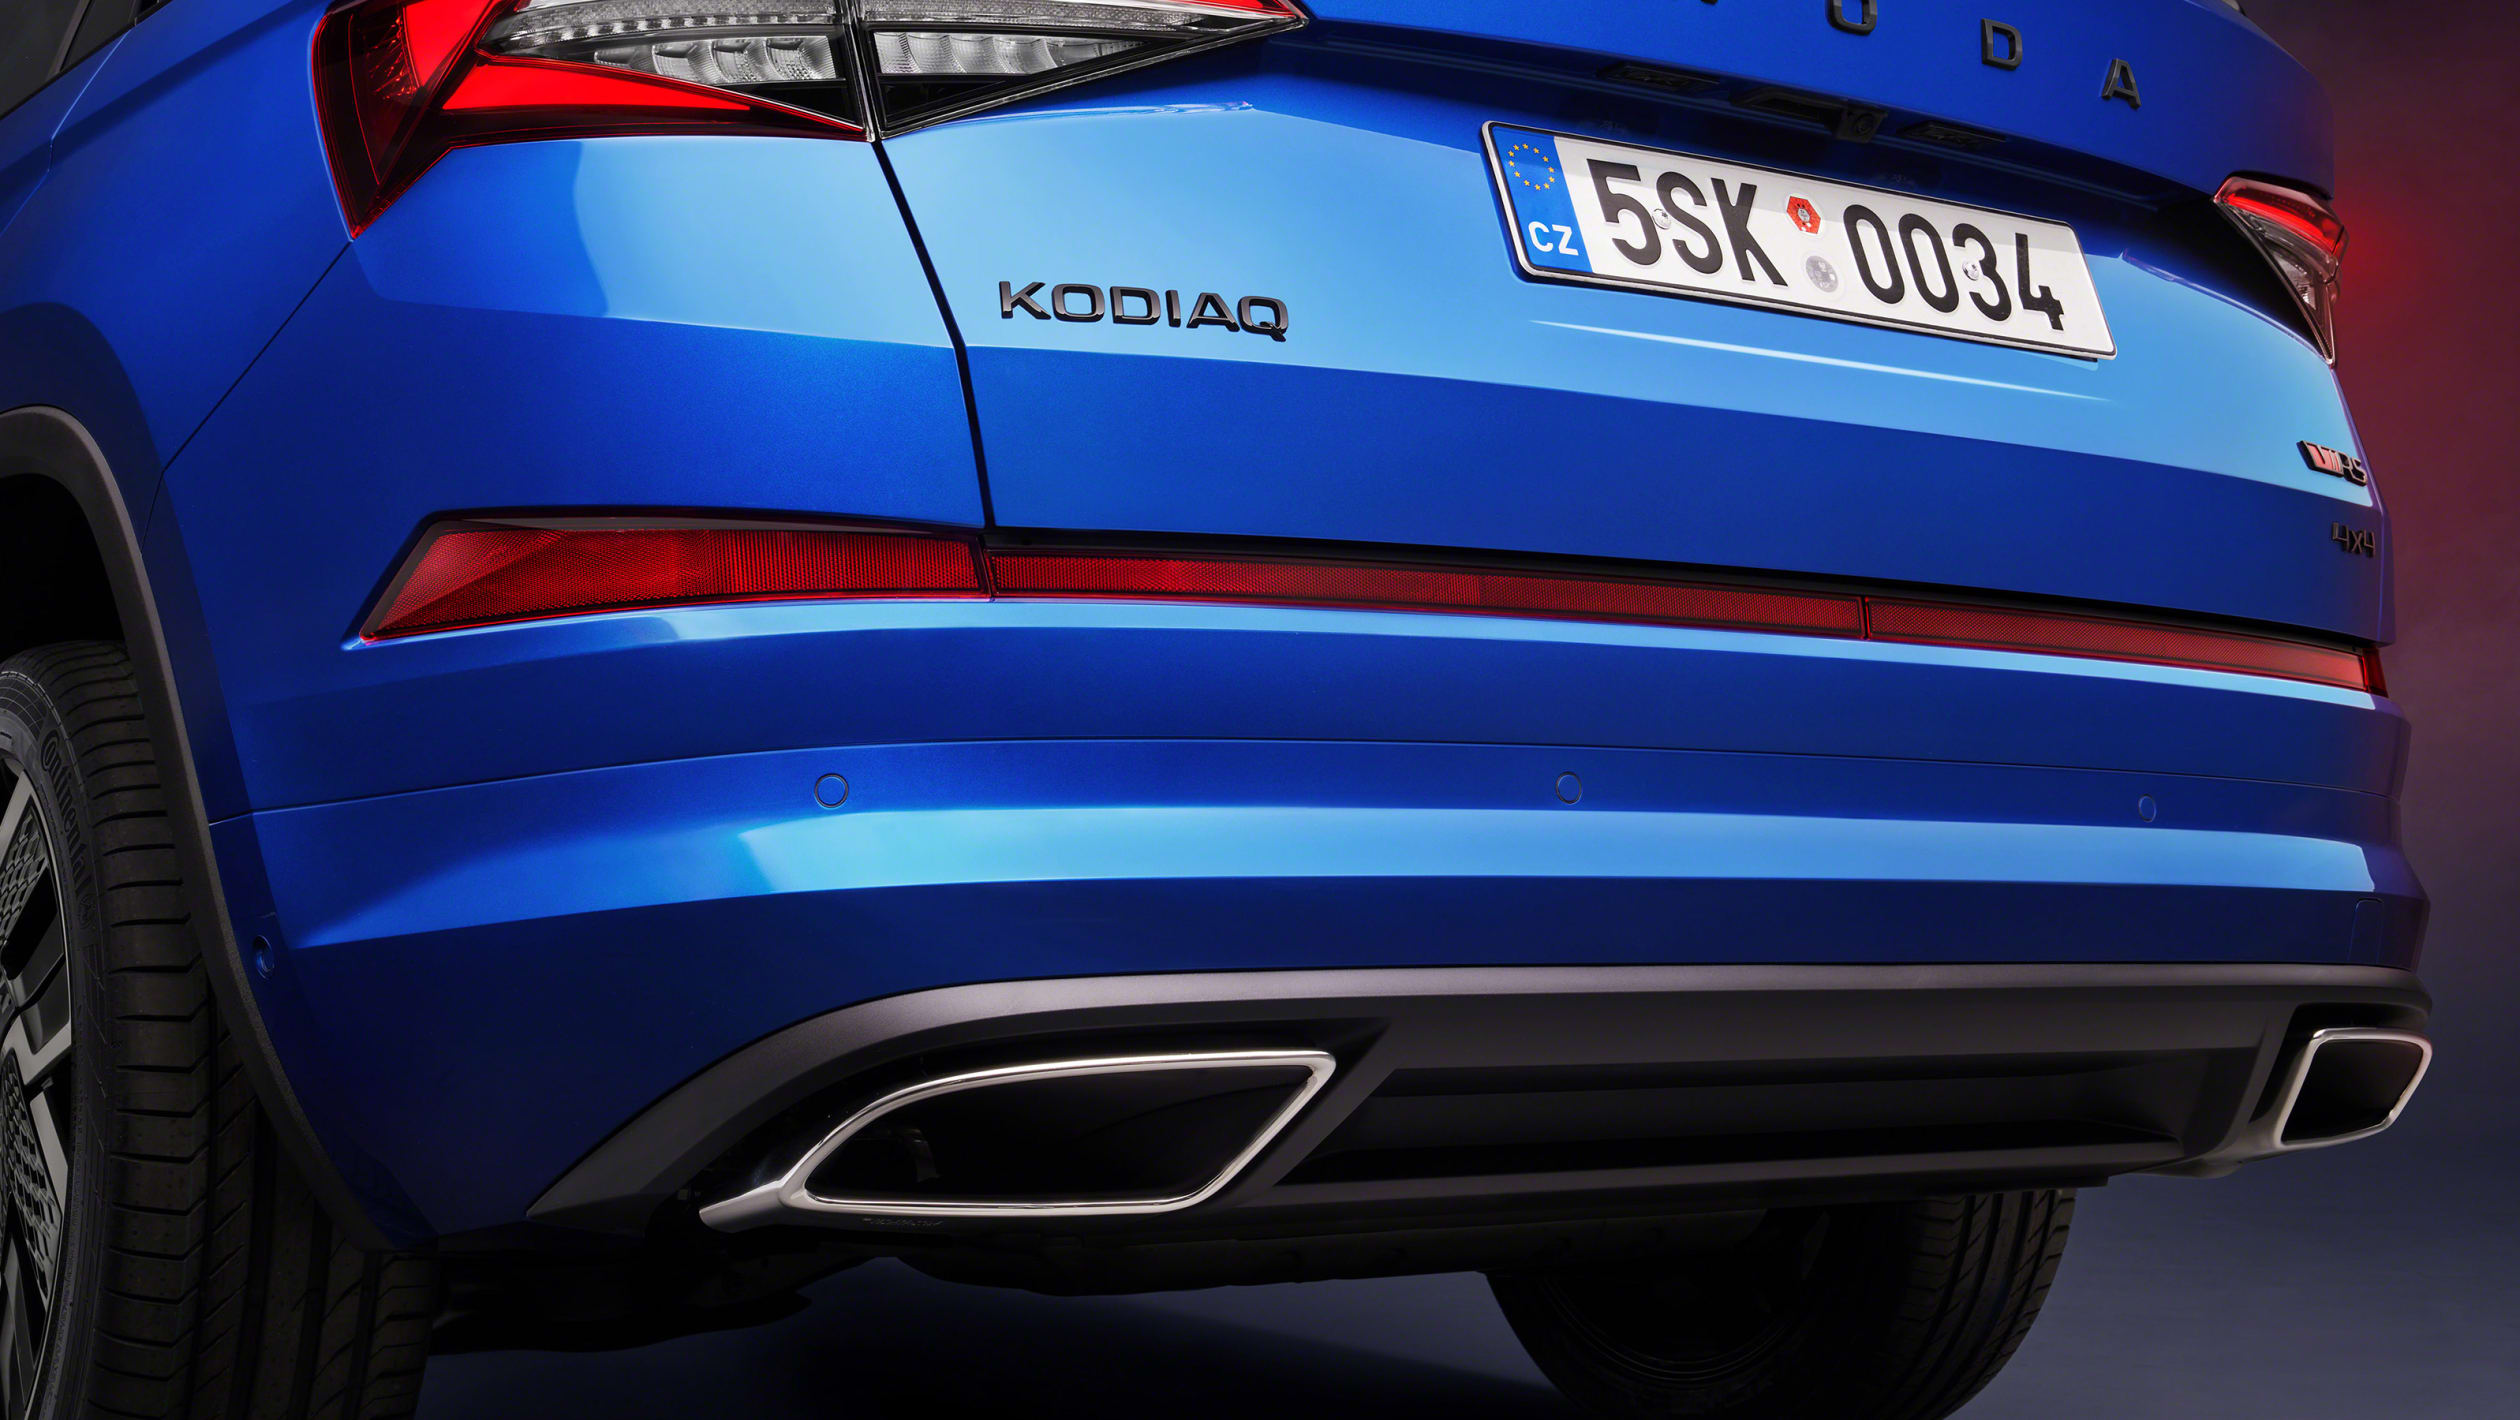 Makyajlı 2021 Skoda Kodiaq tanıtıldı